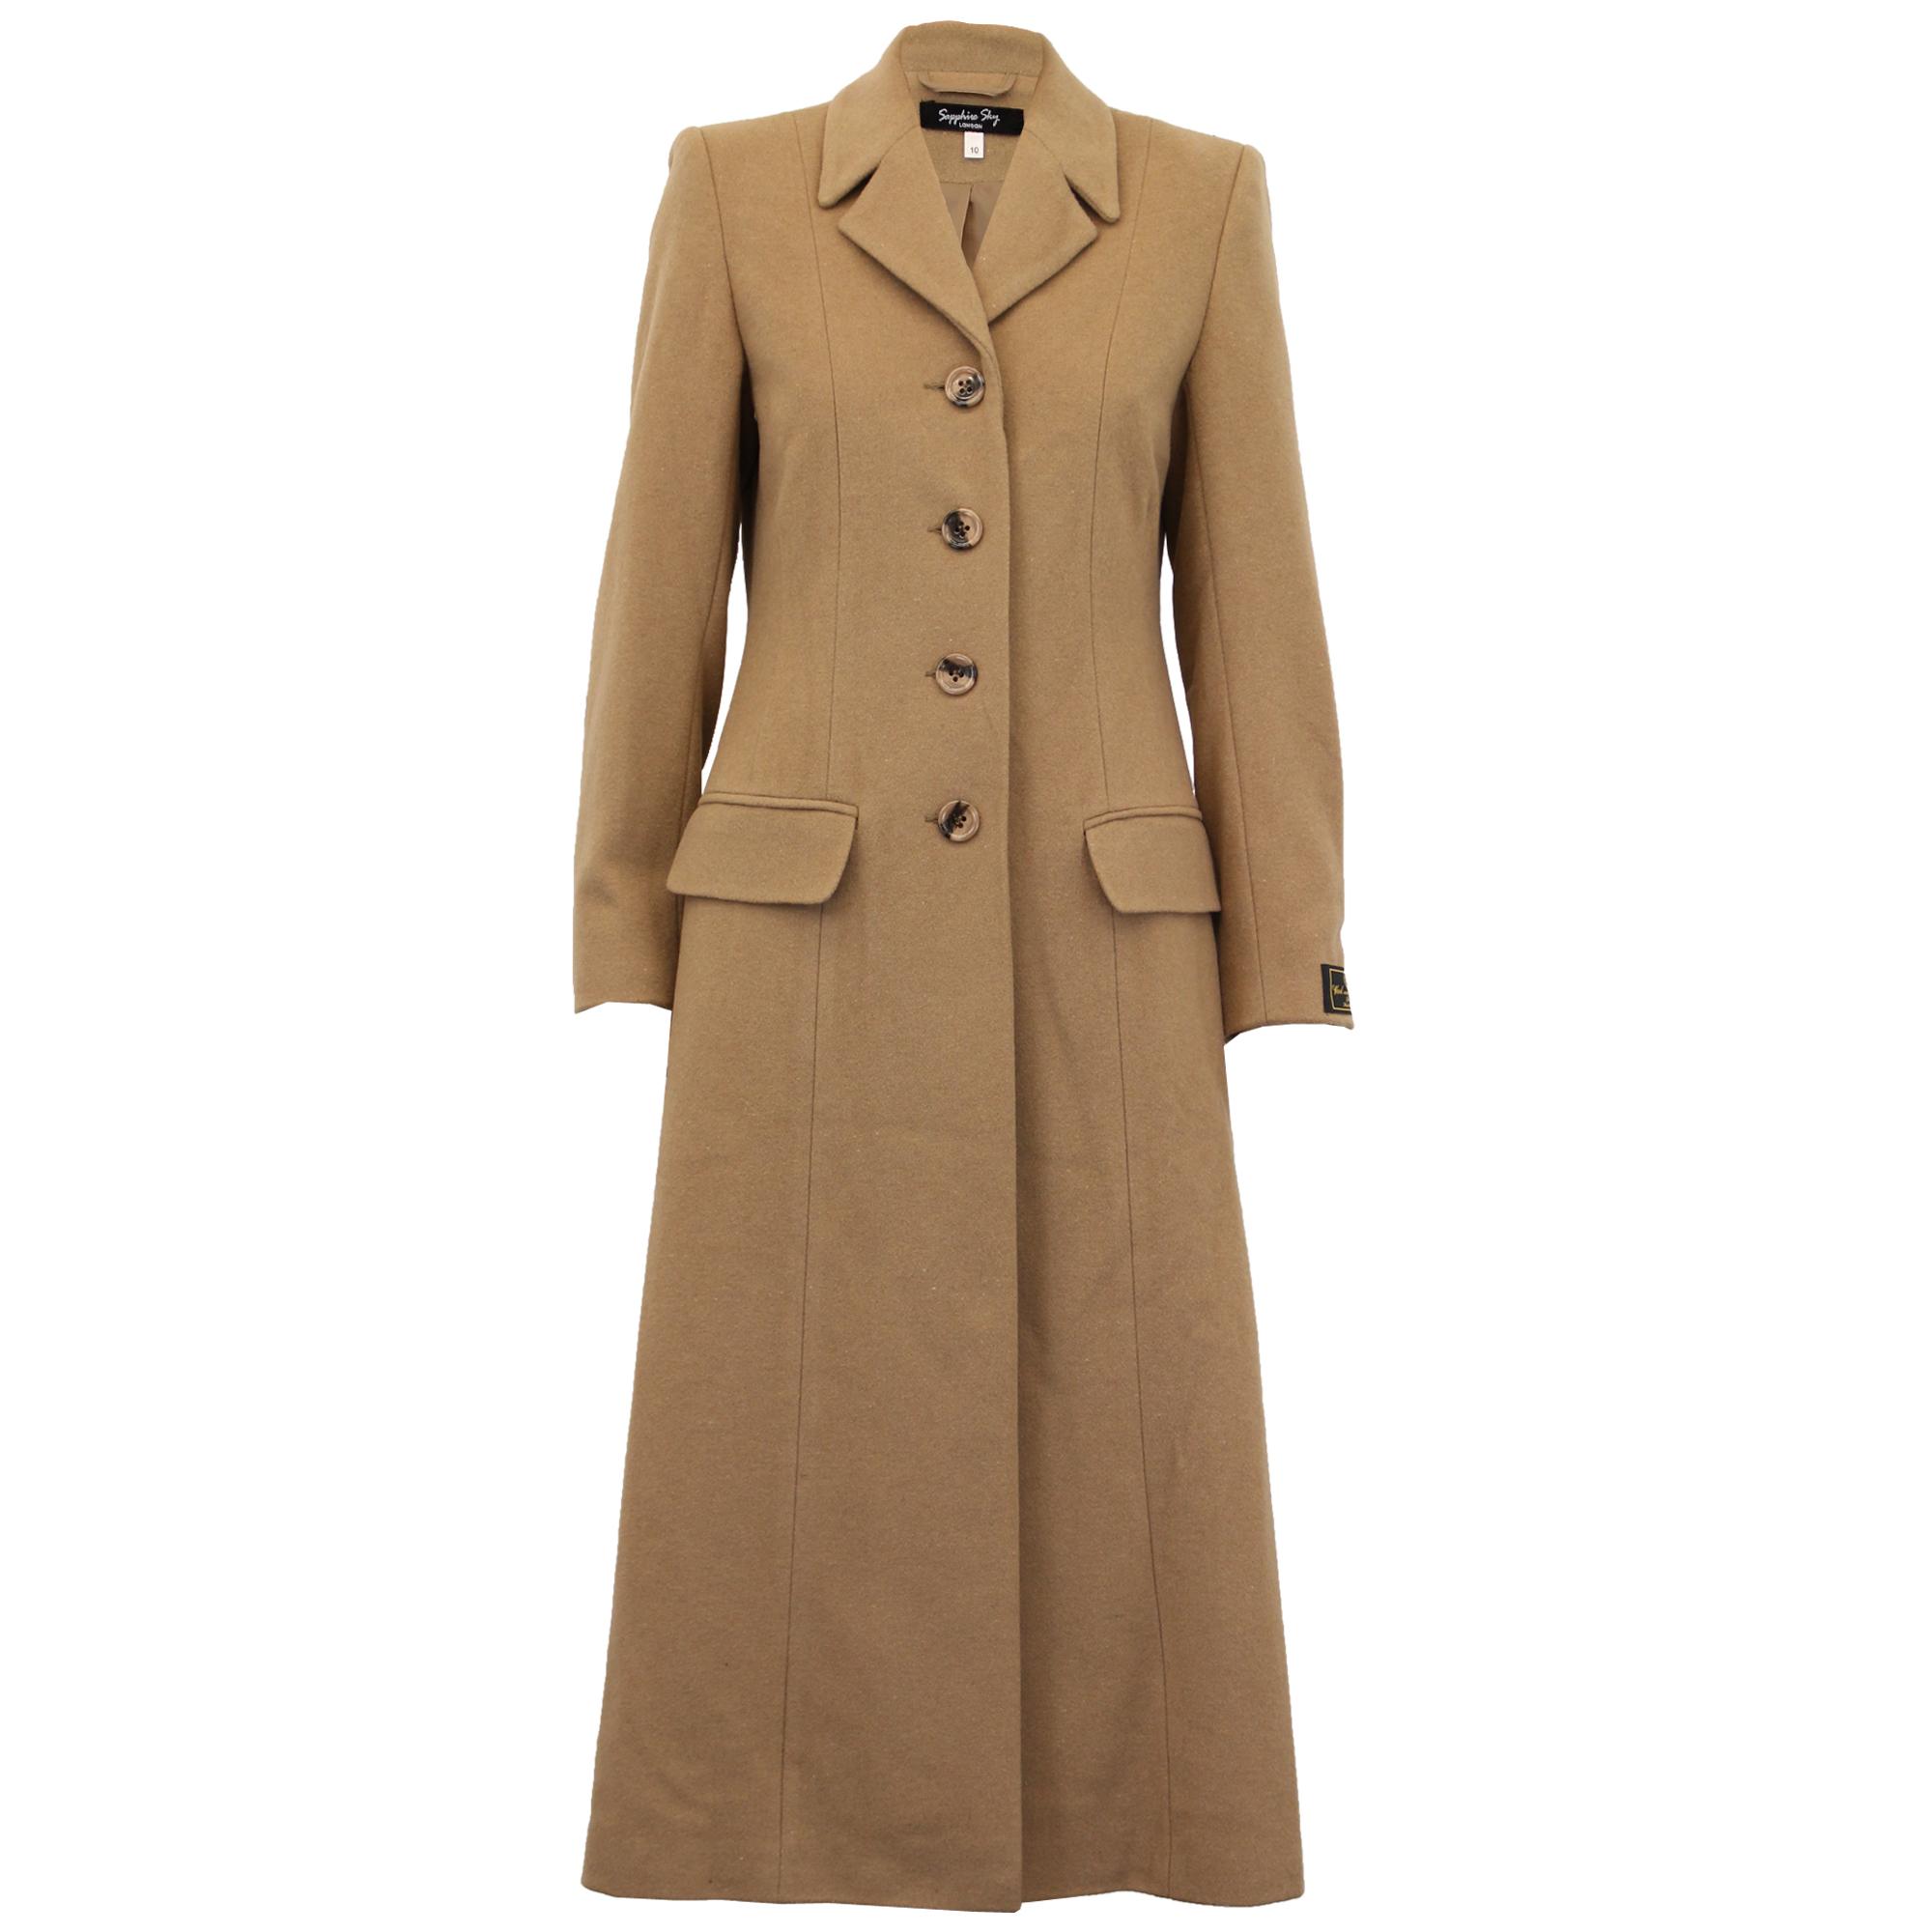 Coats for women ebay